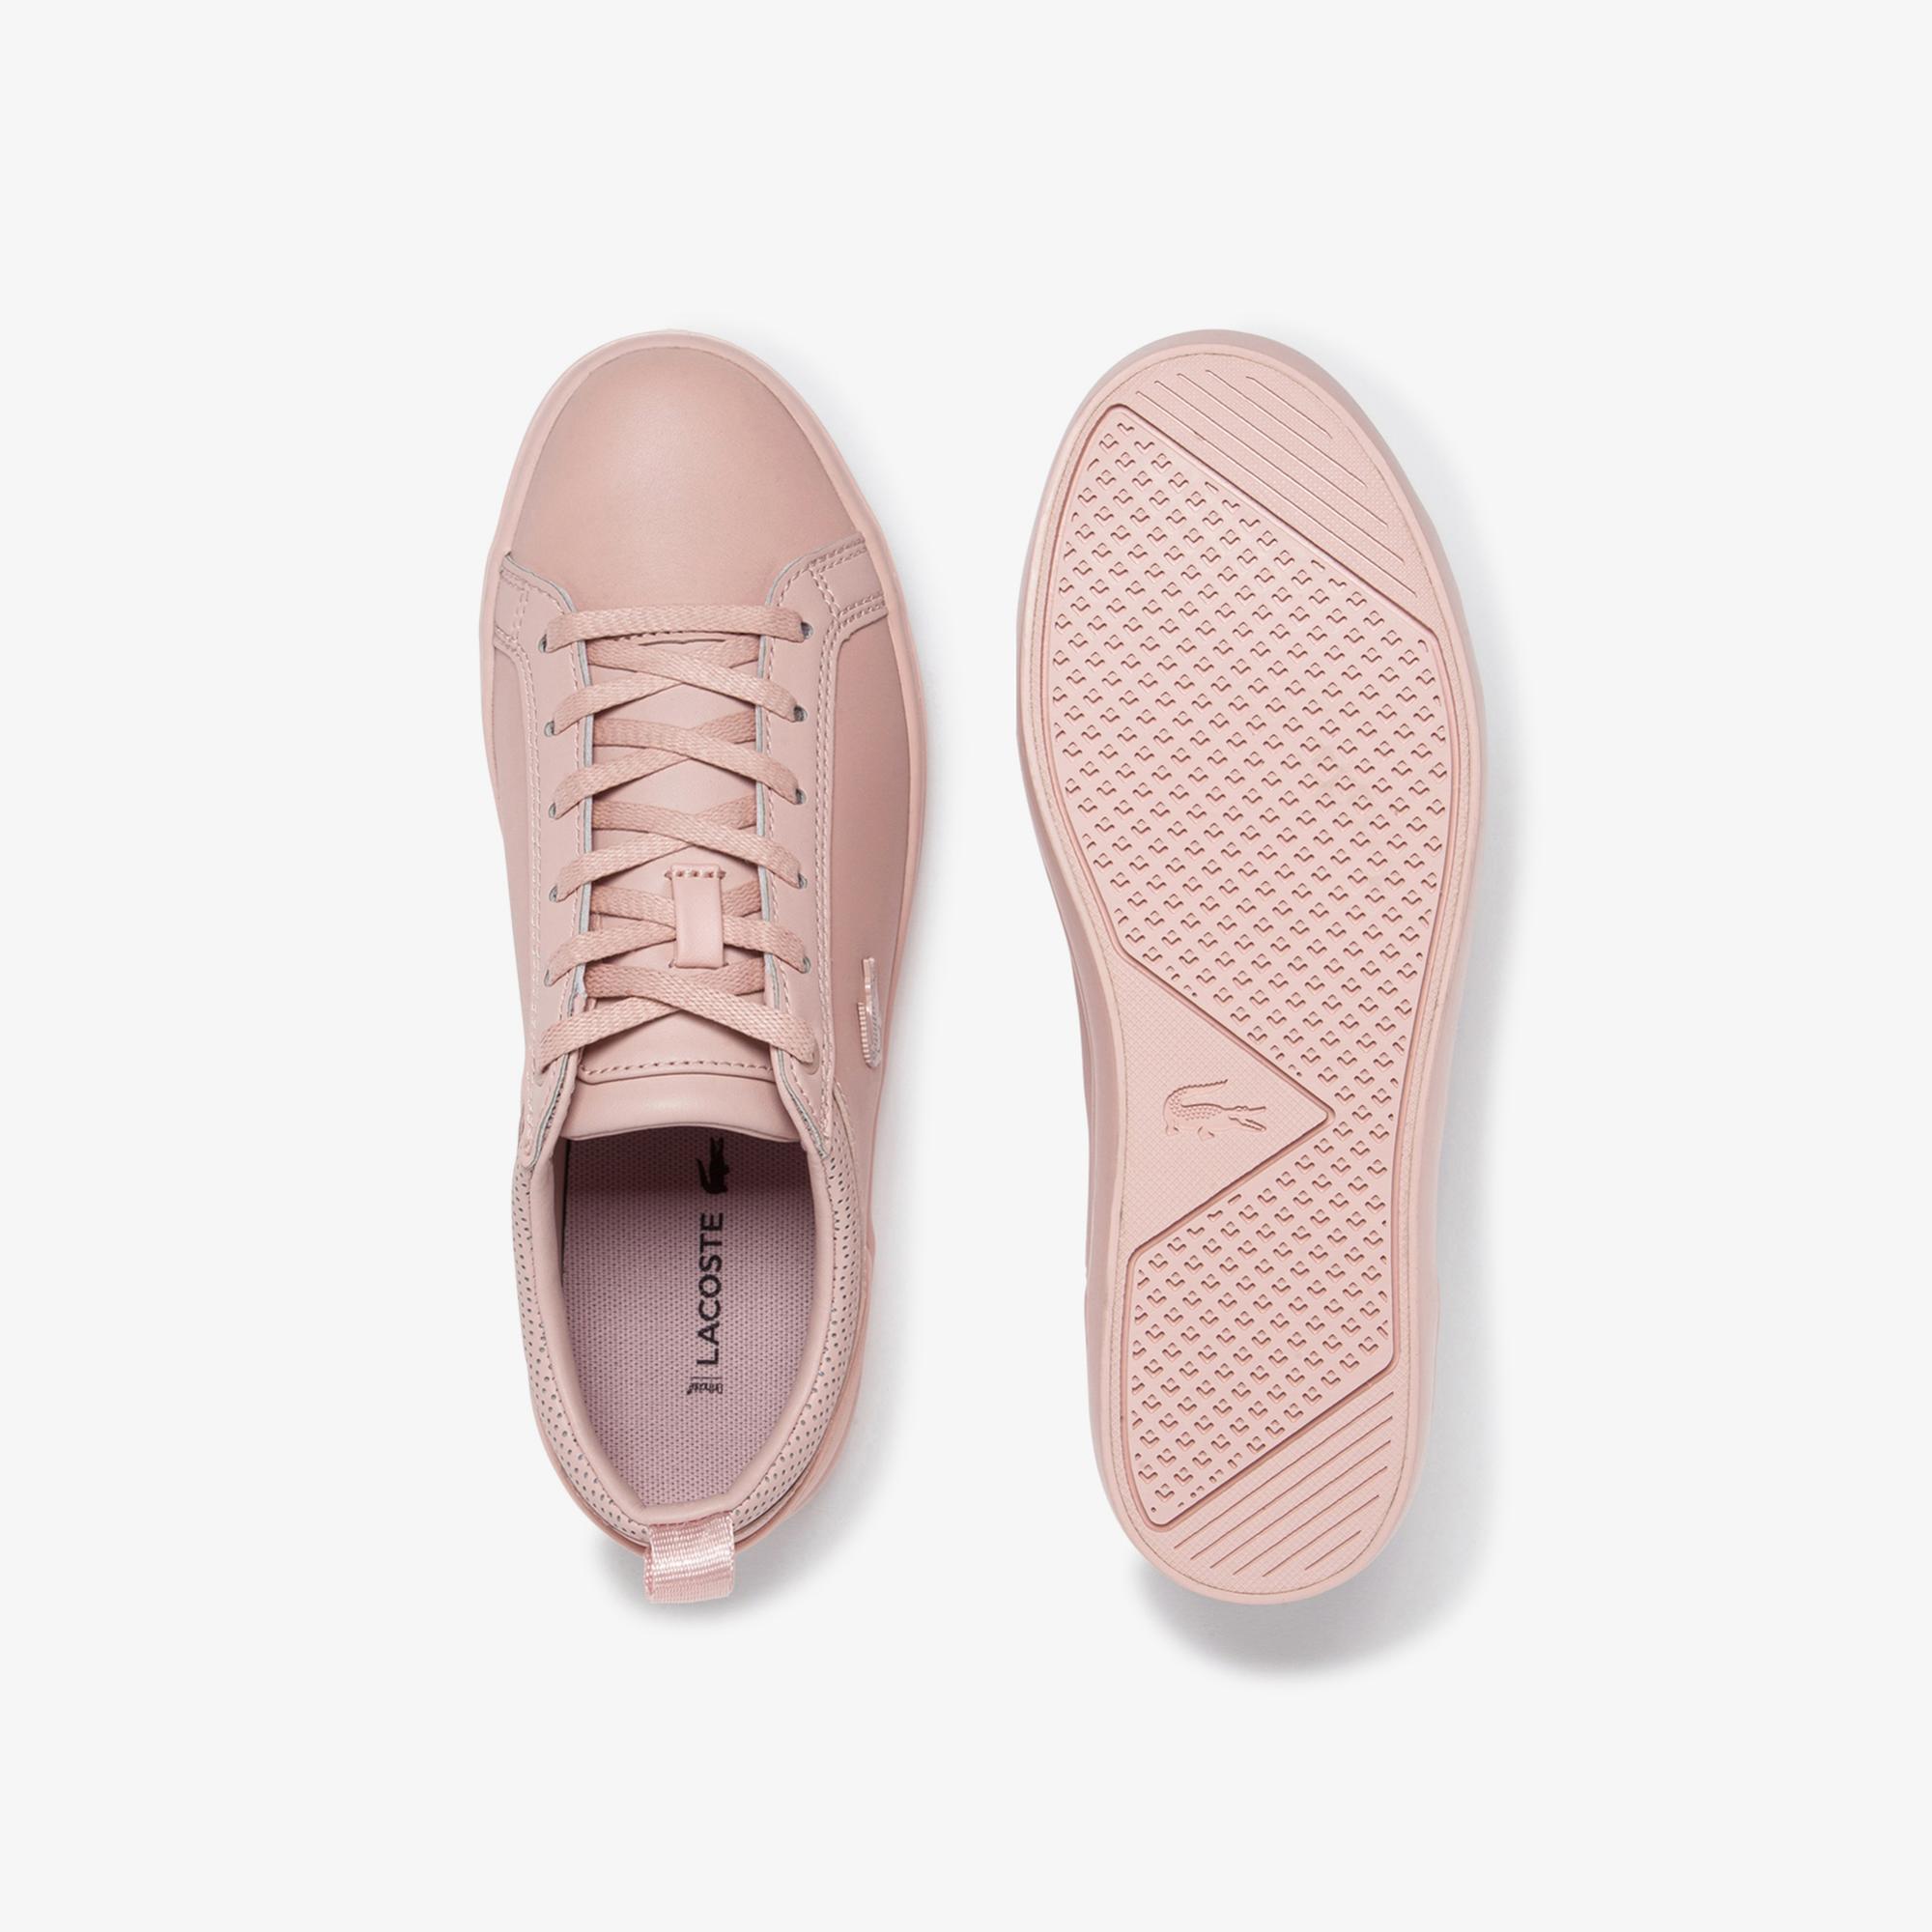 Lacoste кросівки жіночі Straightset